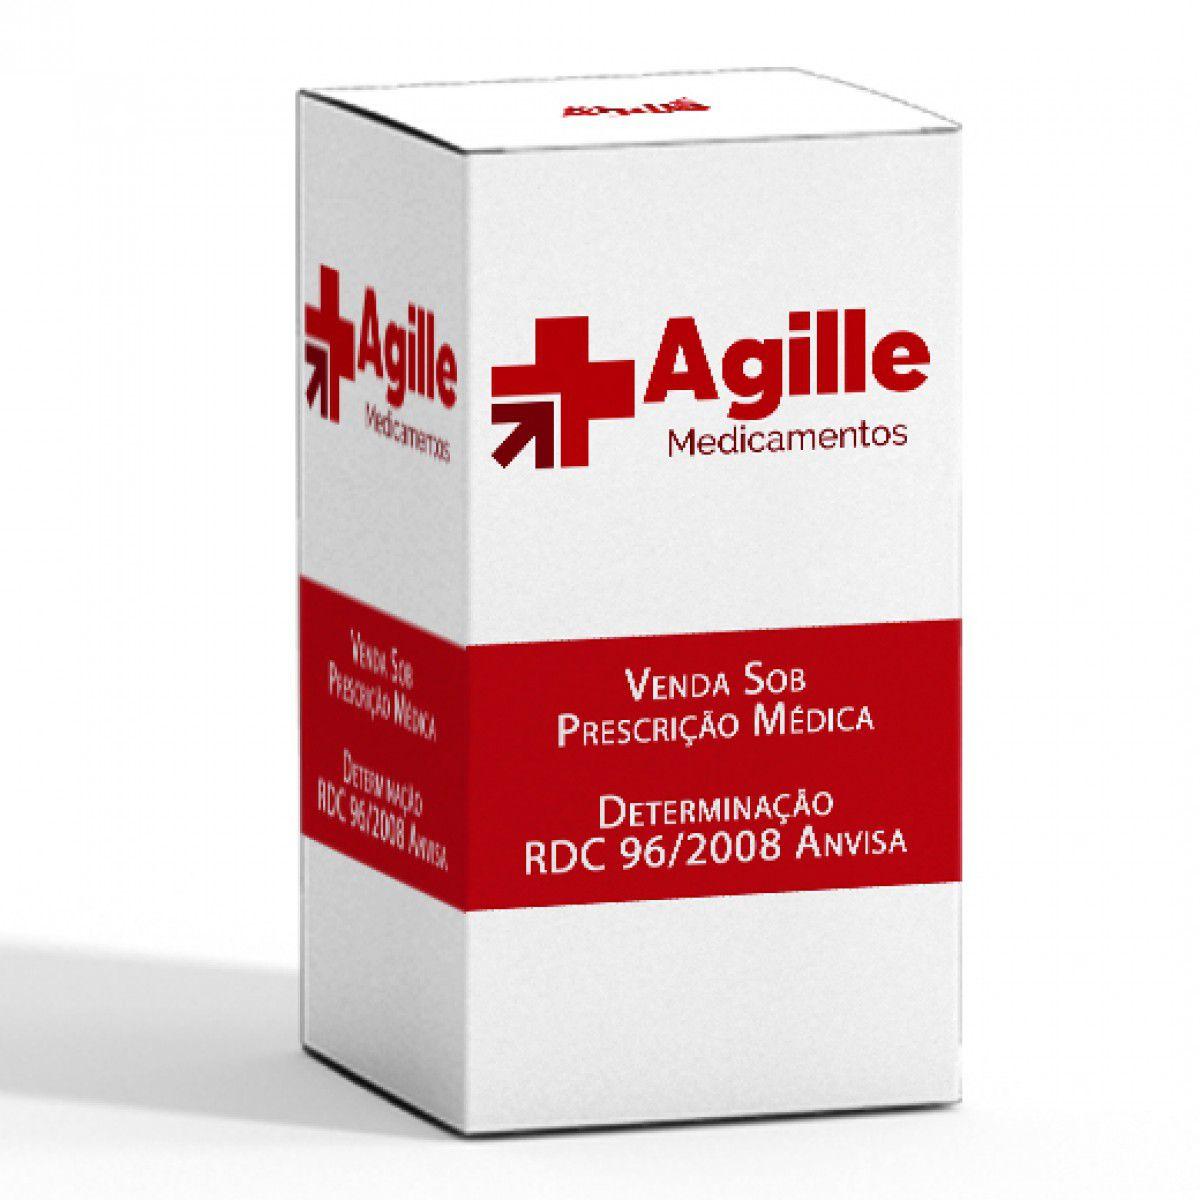 ACETATO DESMOPRESSINA 0,1MG/ML (1FRA X 2,5ML) <G>  - Agille Speciality